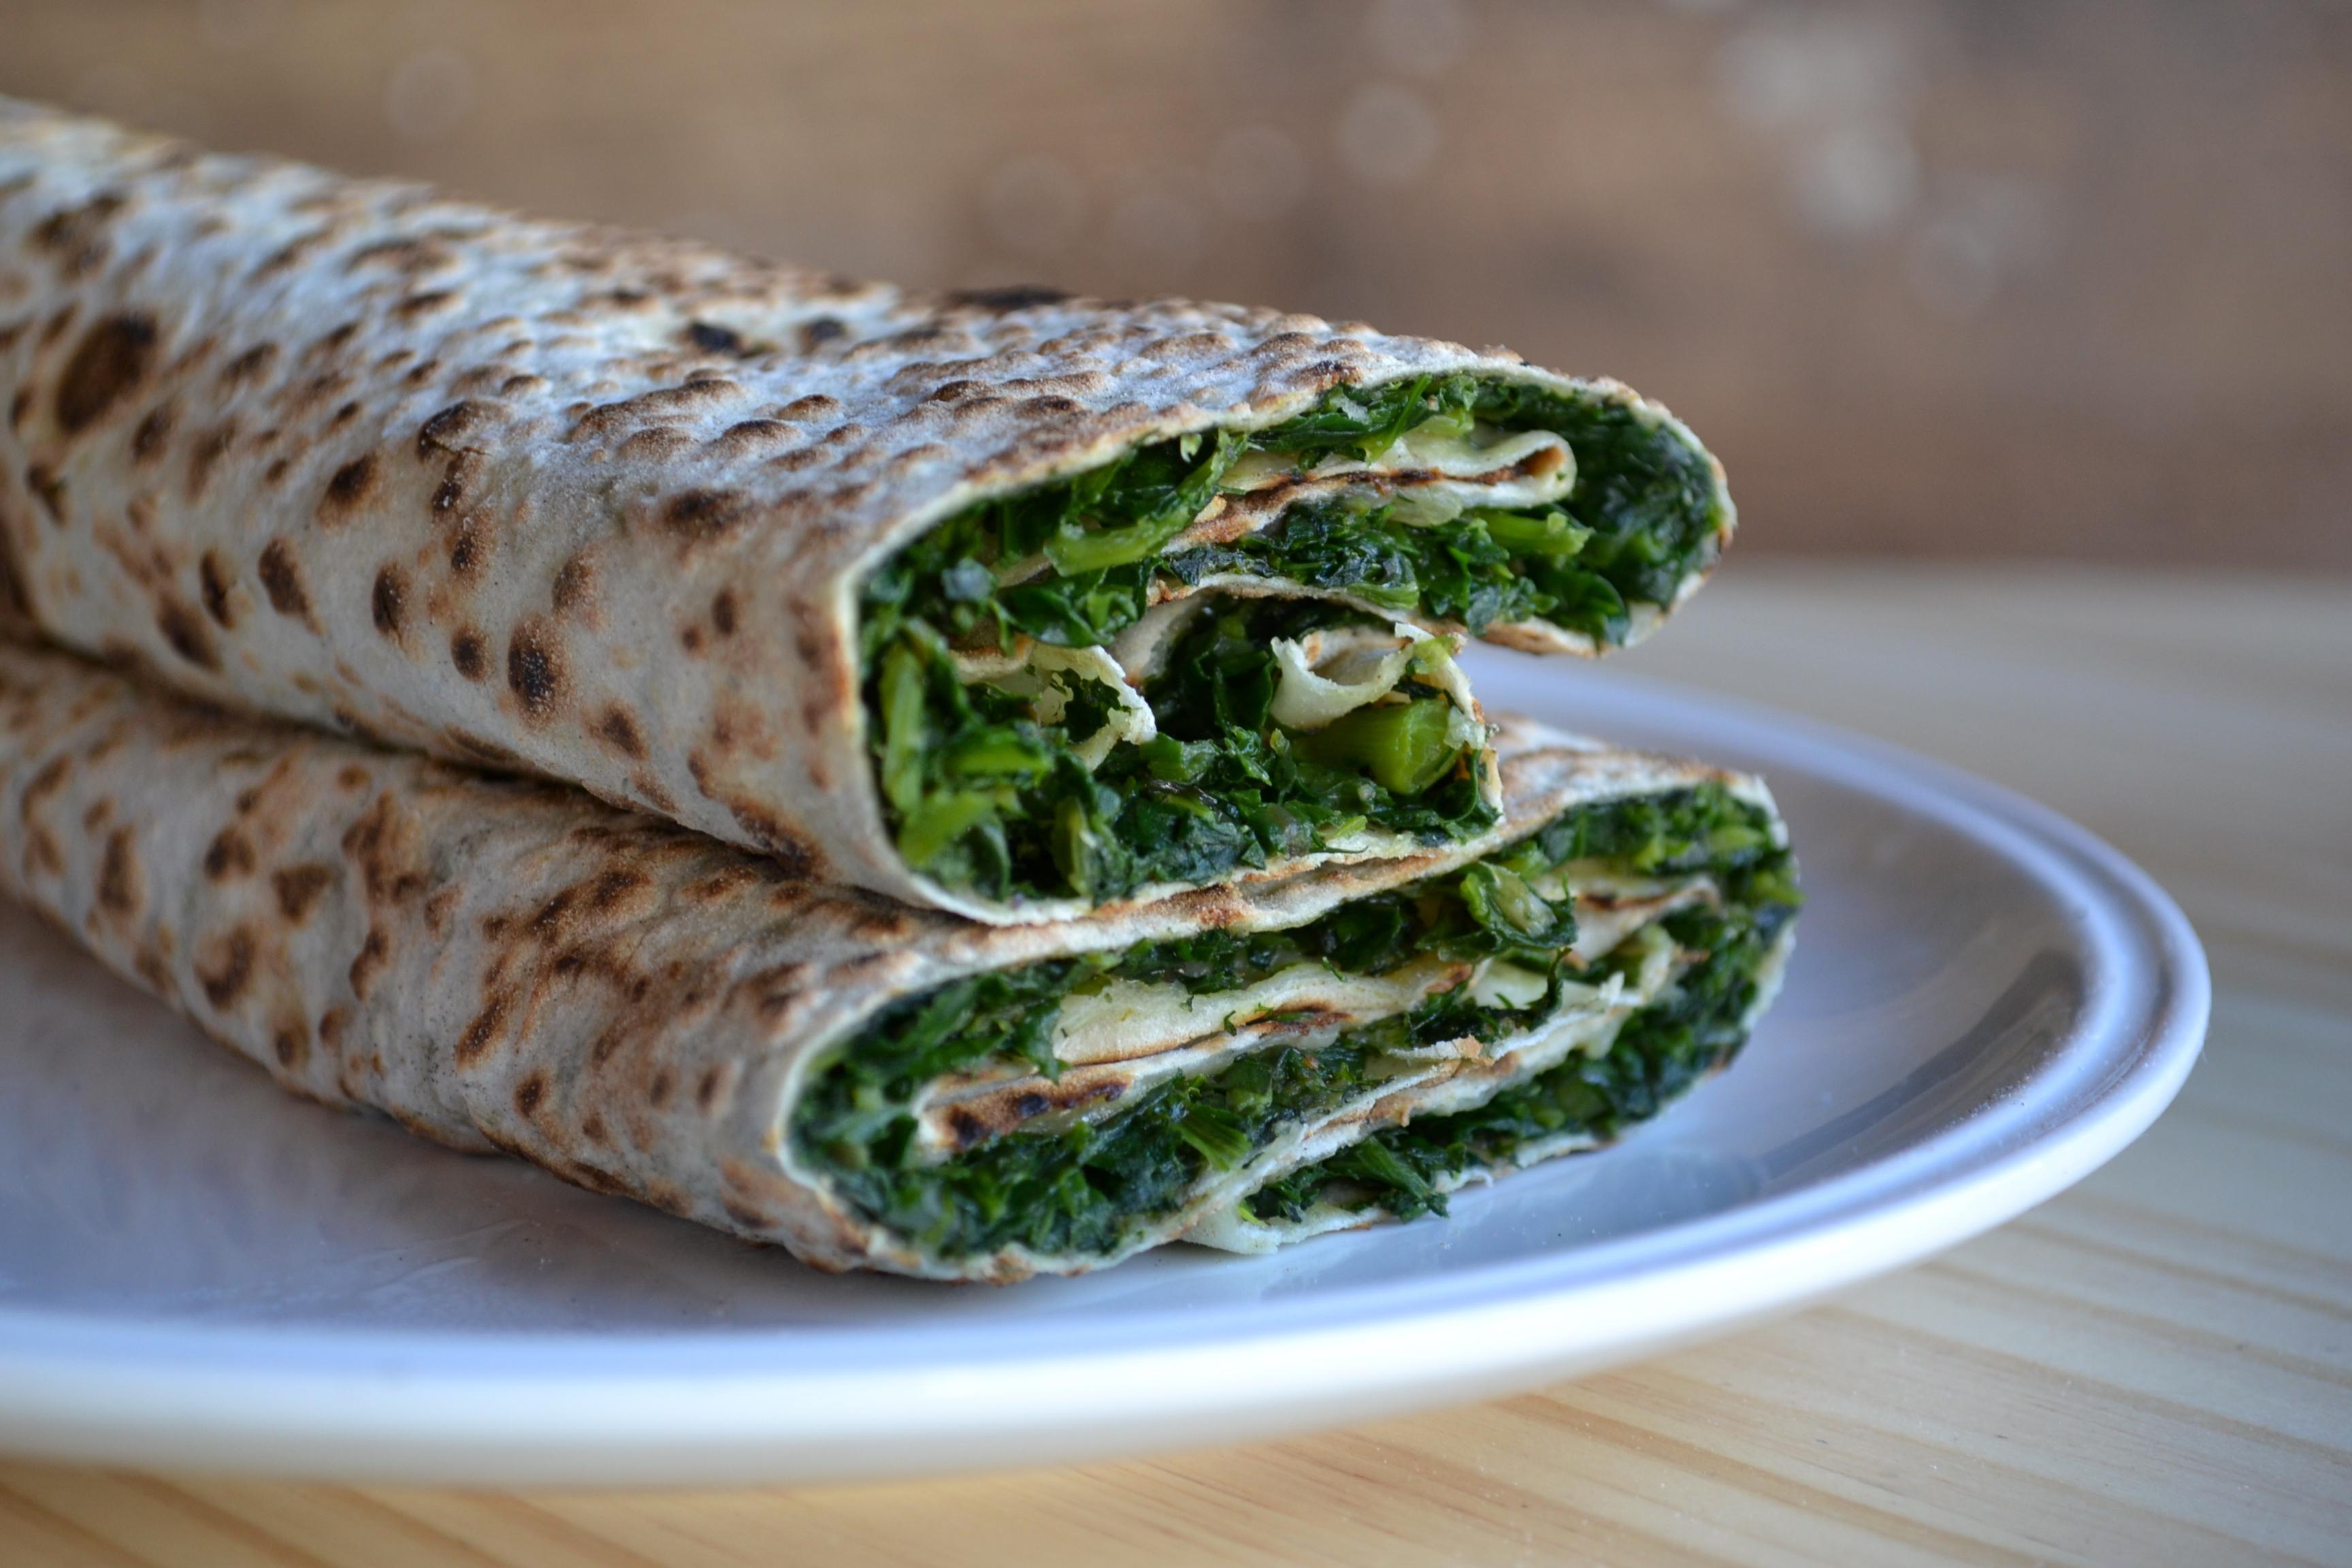 Vivid green greens and herbs fill Zhengyalov Hatz's signature flatbread.